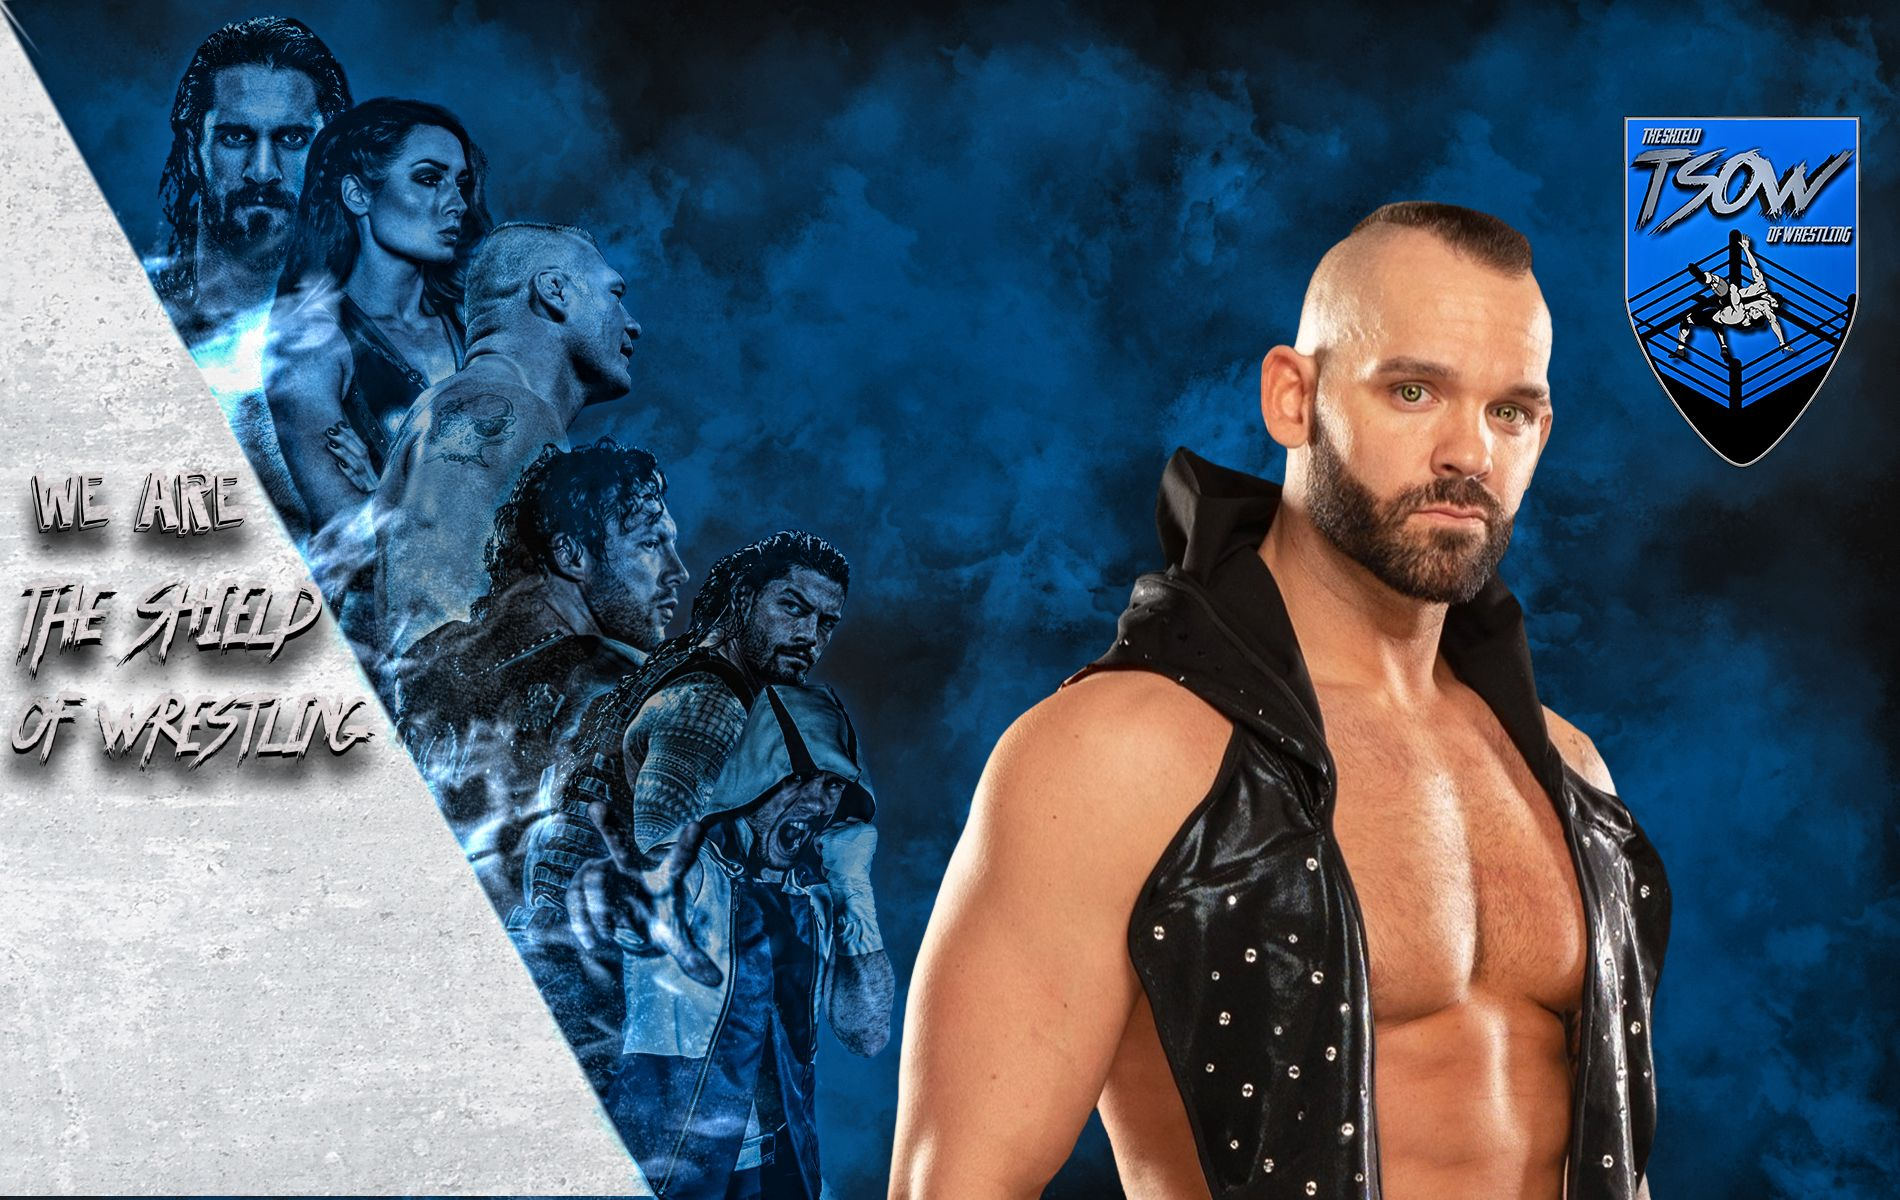 AEW e NJPW: Shawn Spears sfida Jay White